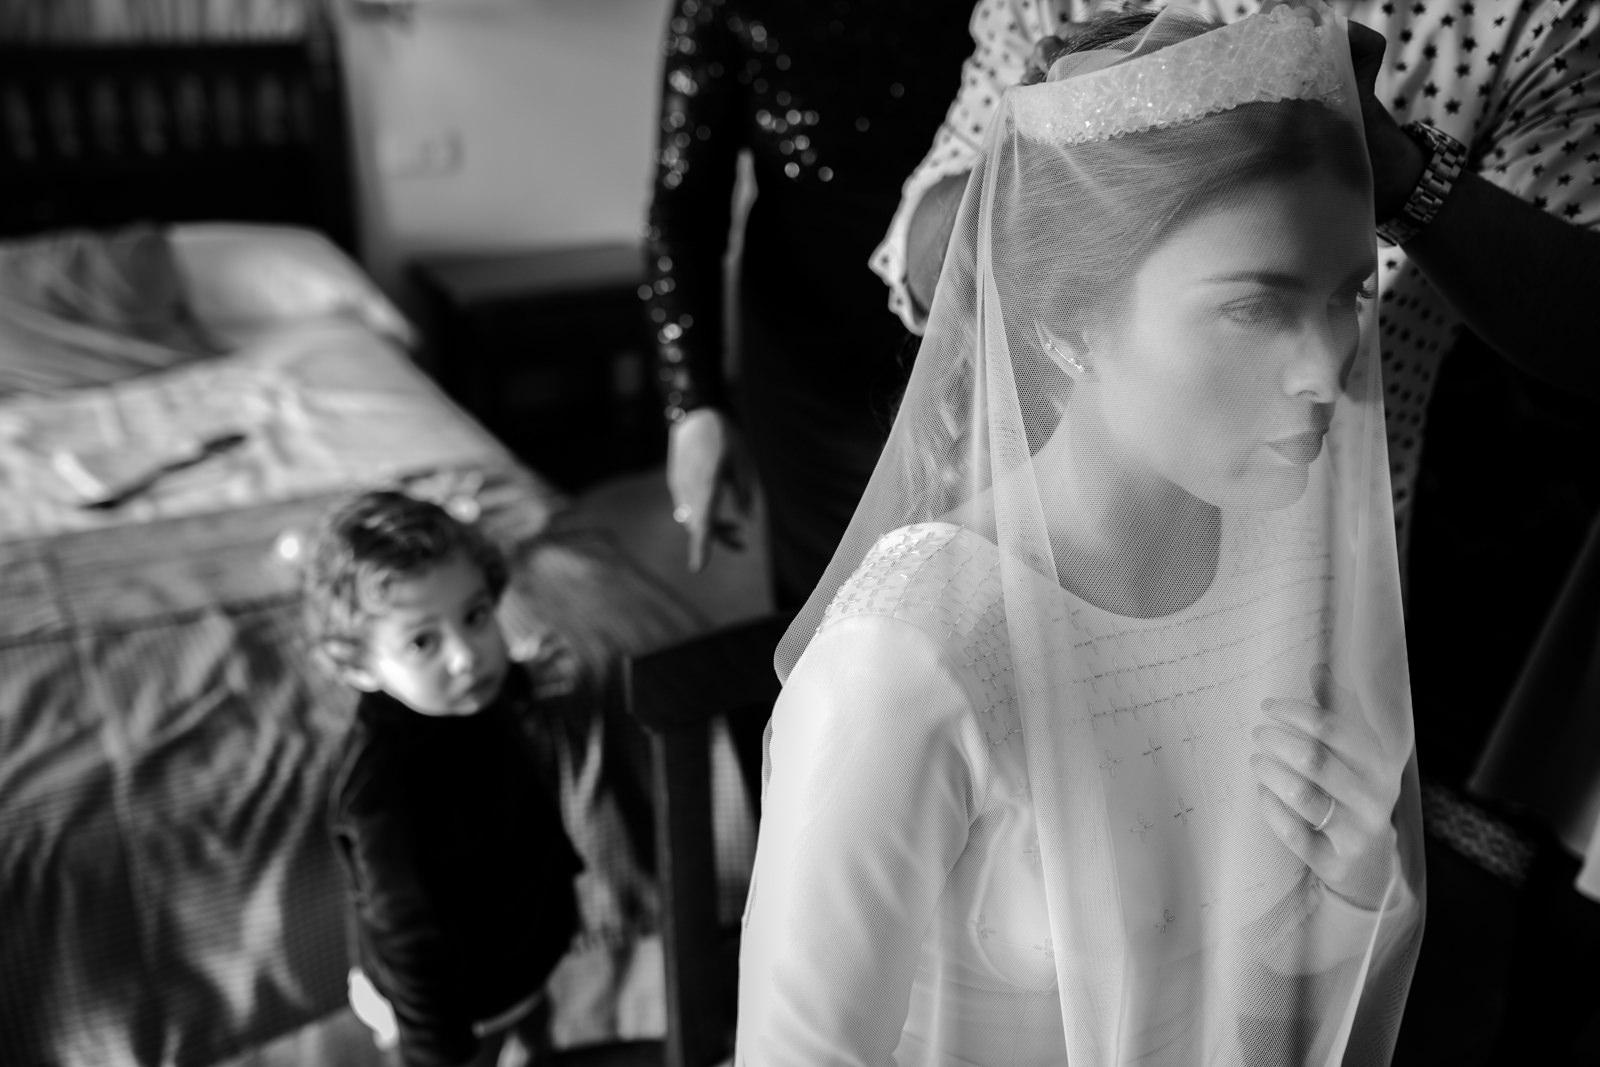 Boda-Sevilla-Parador-Carmona-bridal-engagement-Rafael-Torres-fotografo-bodas-sevilla-madrid-barcelona-wedding-photographer--24.jpg